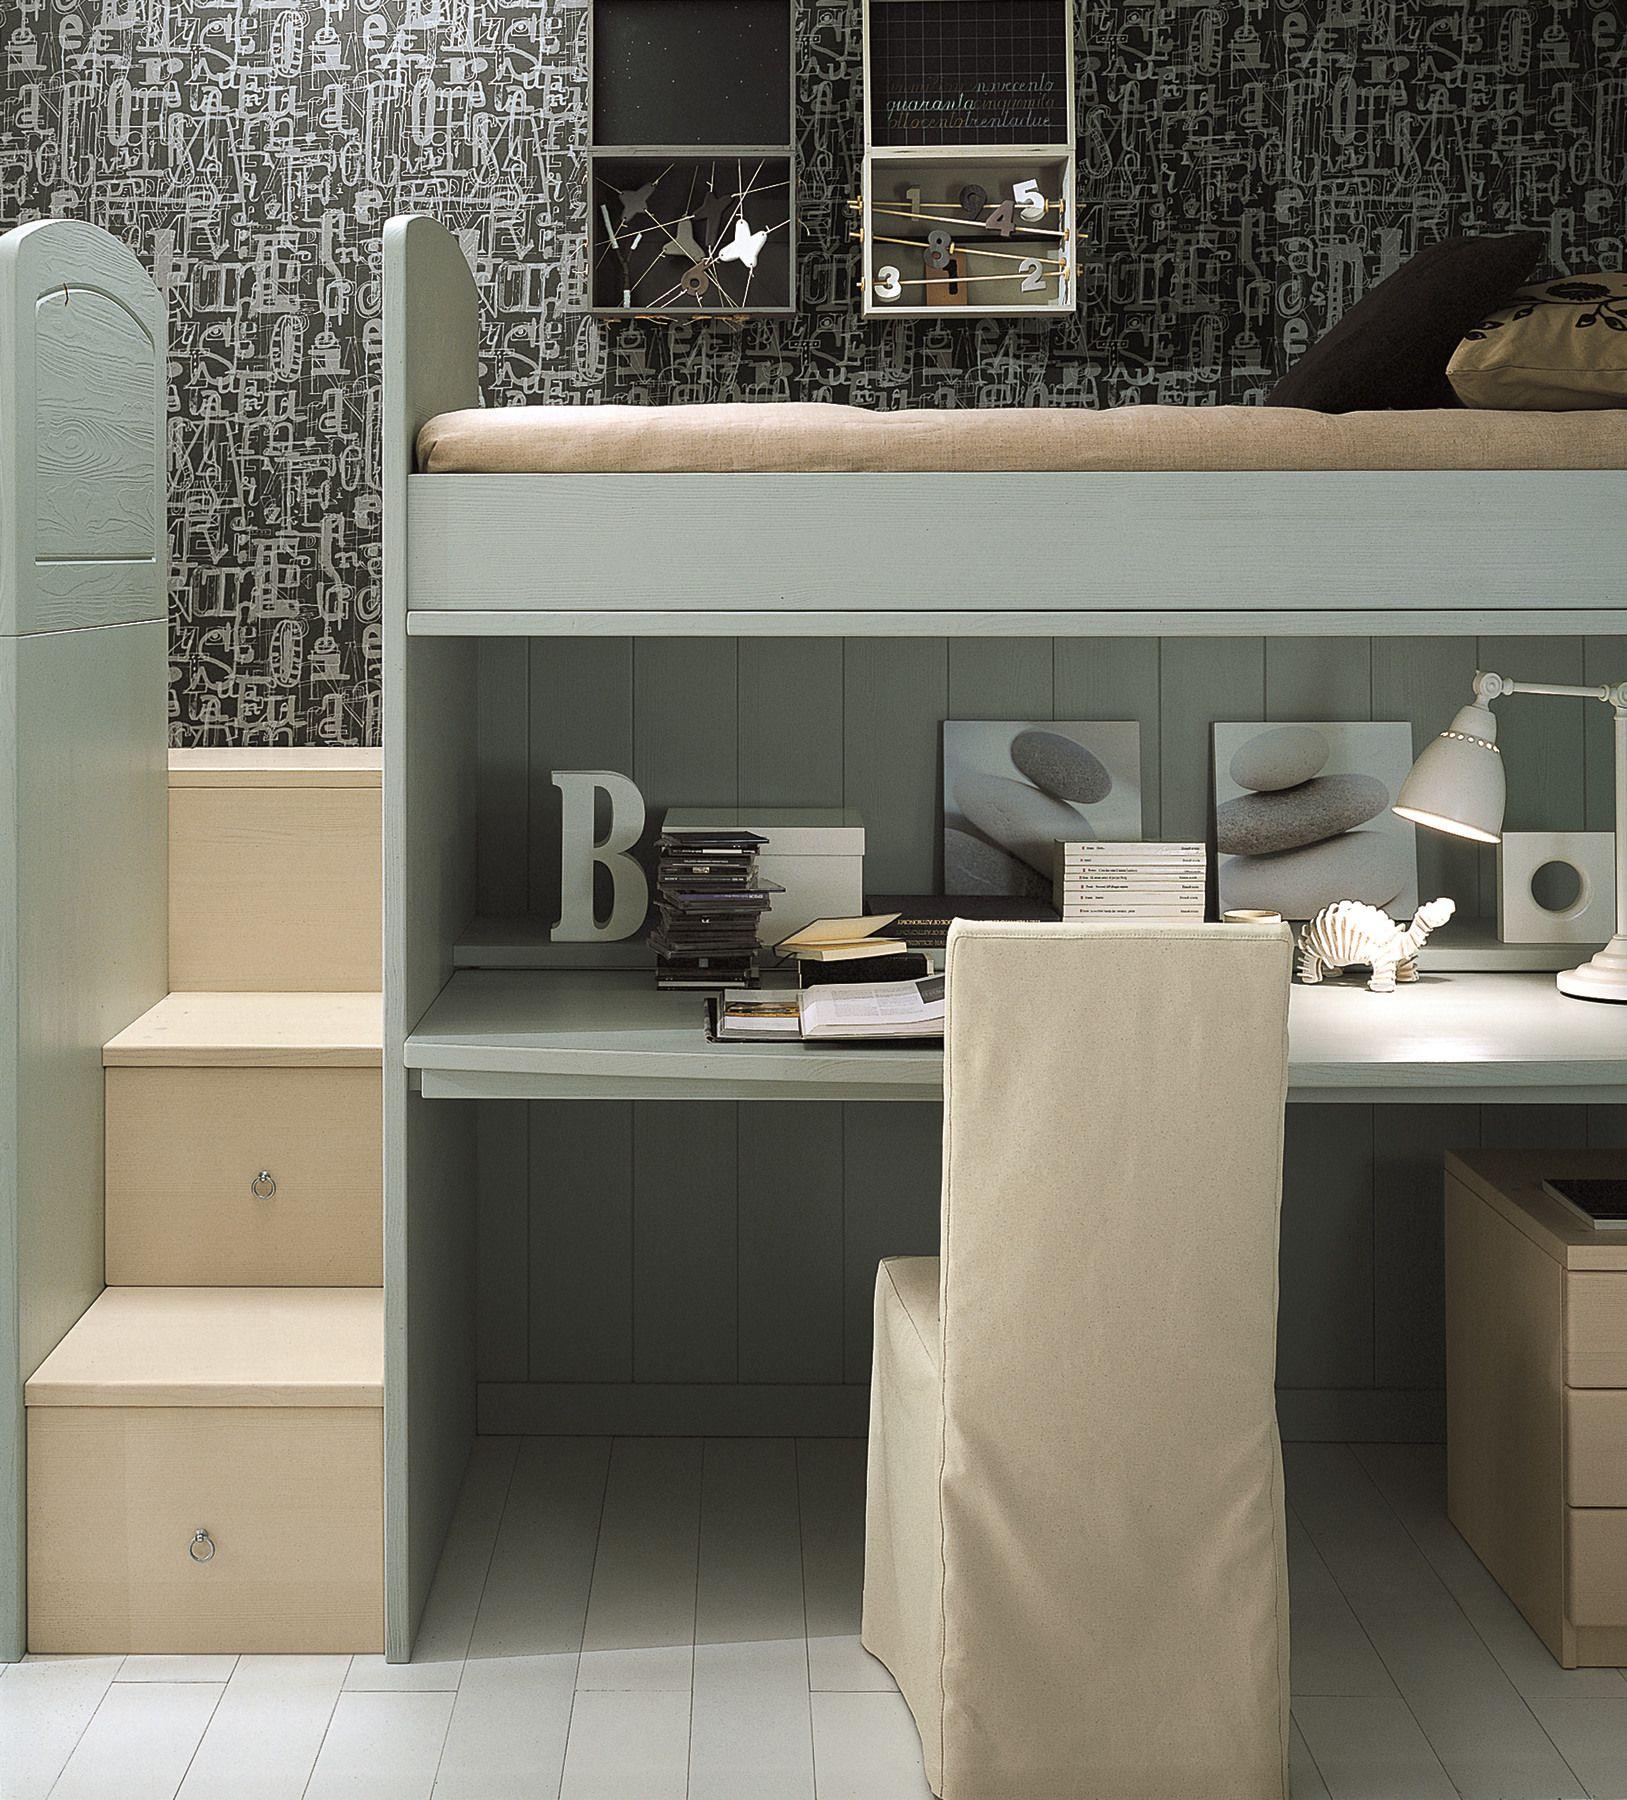 Chambre mezzanine pour gar§on fille NUOVO MONDO N16 by Scandola